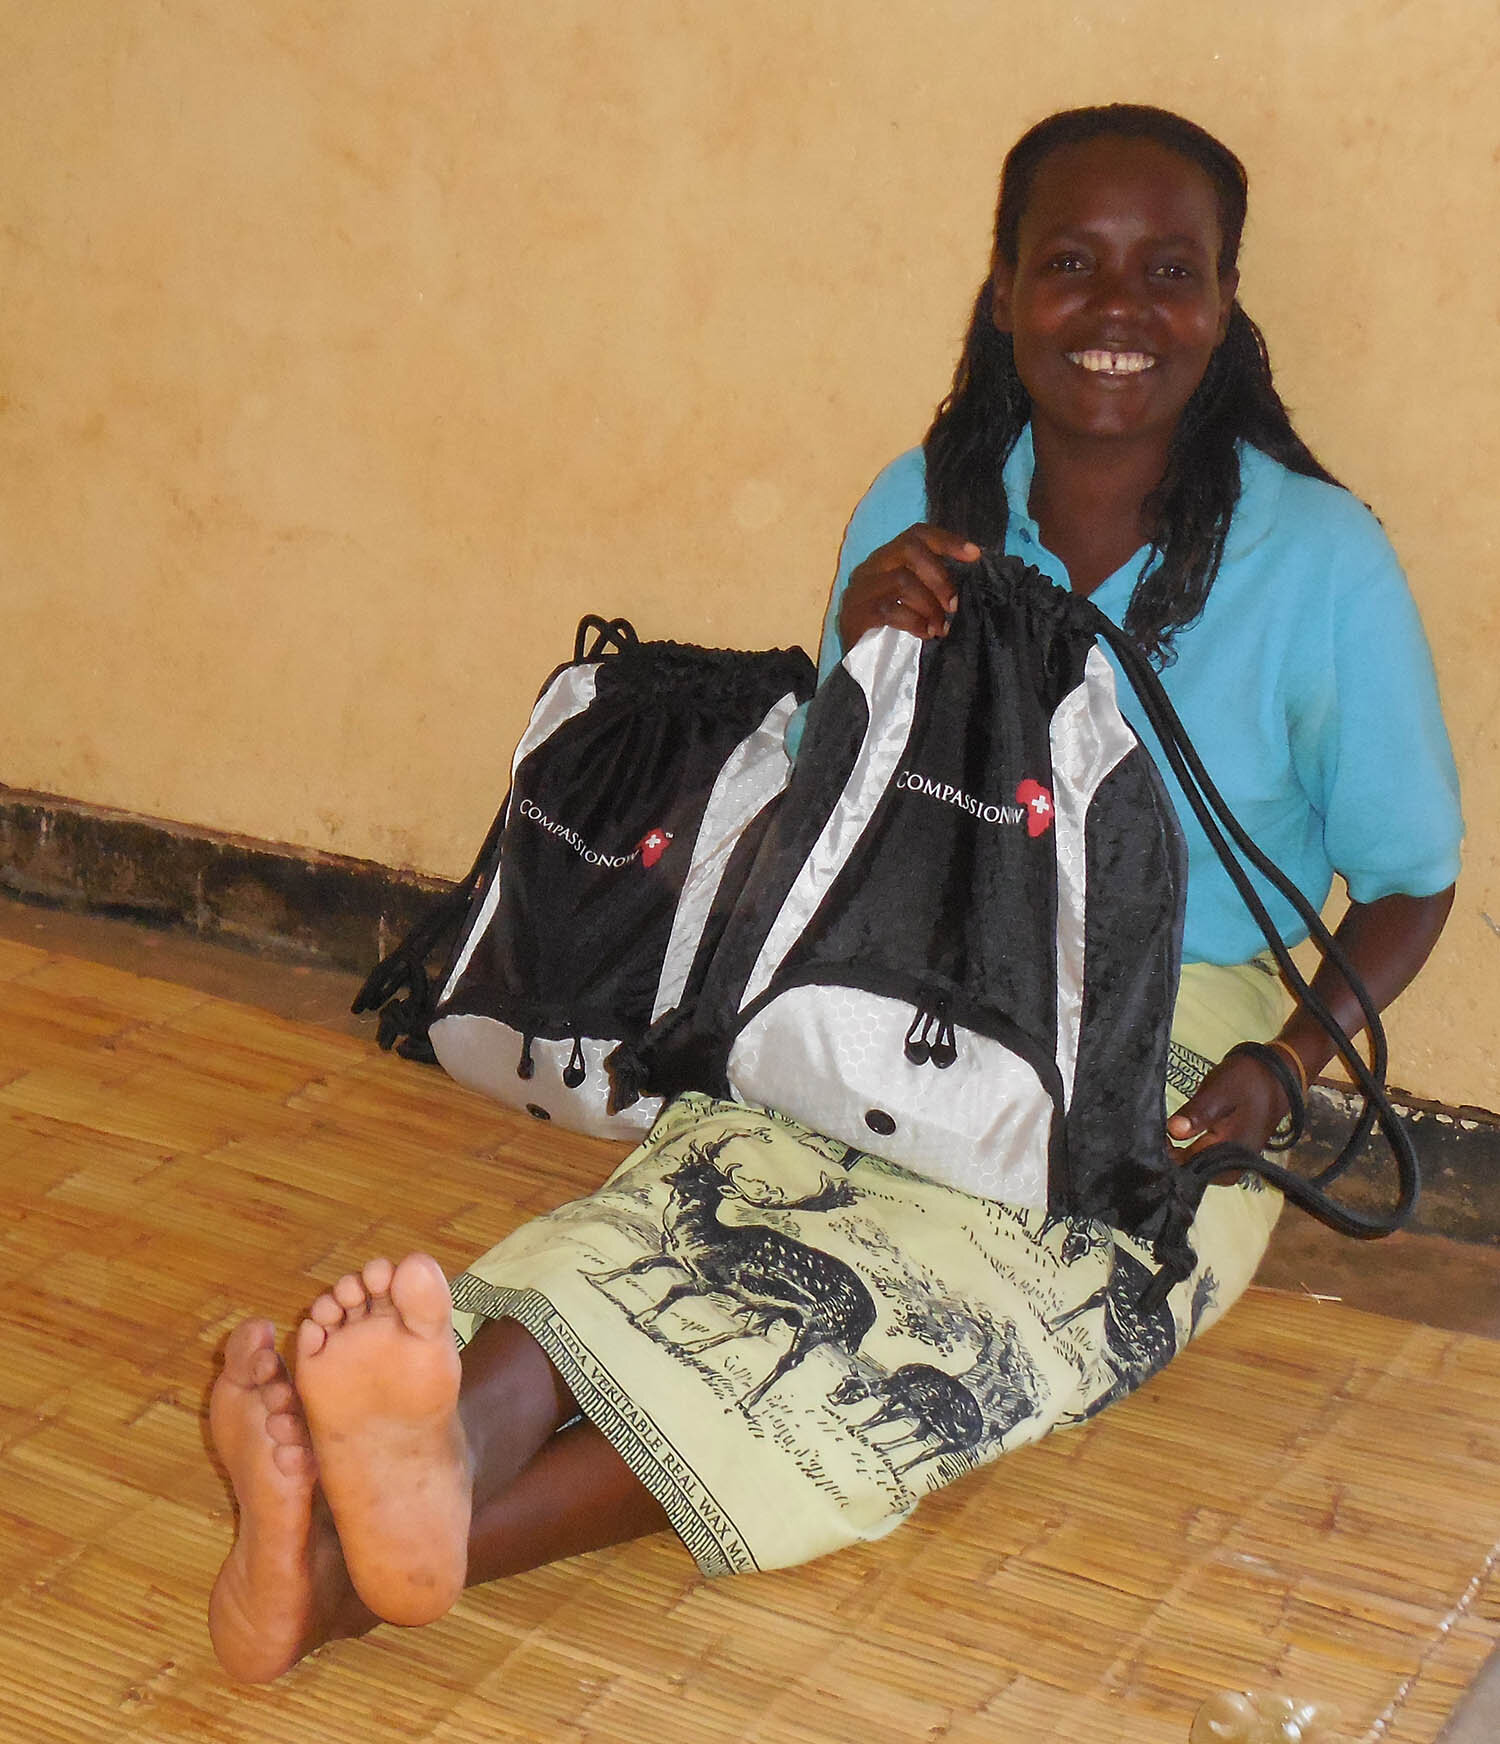 Passion_Center_Malawi8.jpg